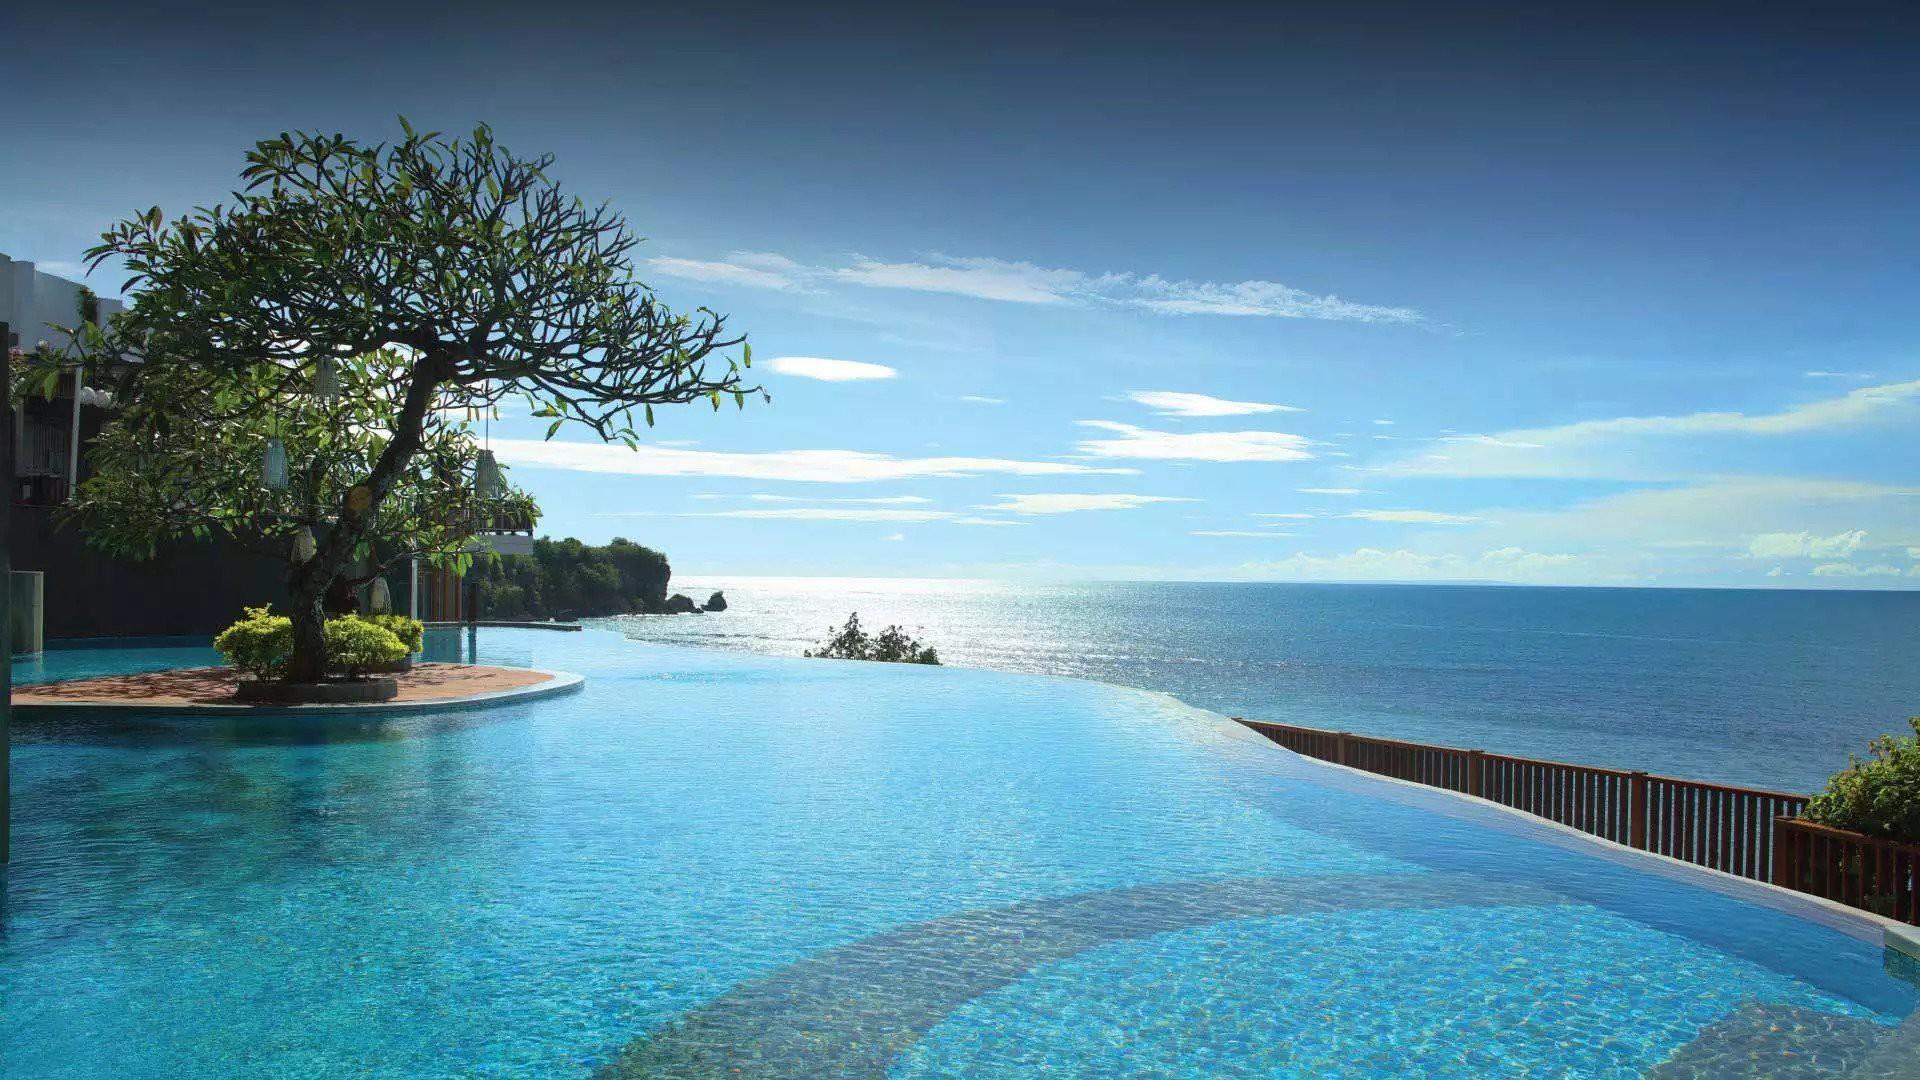 Courtesy of Anantara Uluwatu Bali Resort / Expedia.com